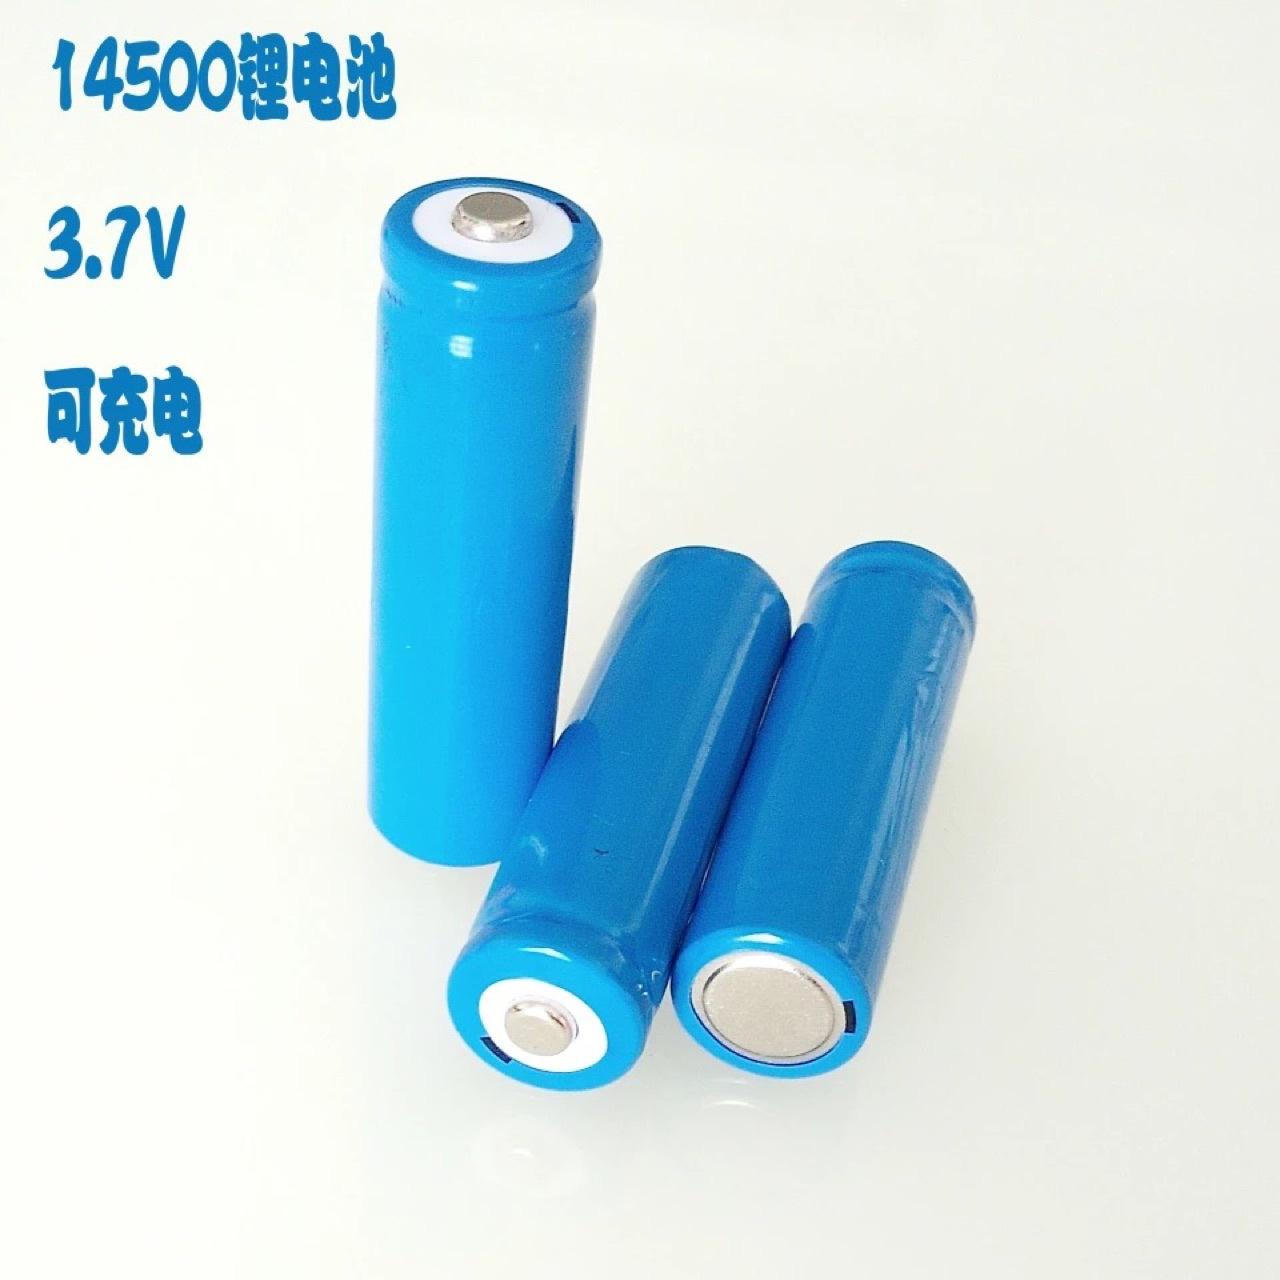 3.7V电子烟5号锂电池 14500足600mAh锂电芯